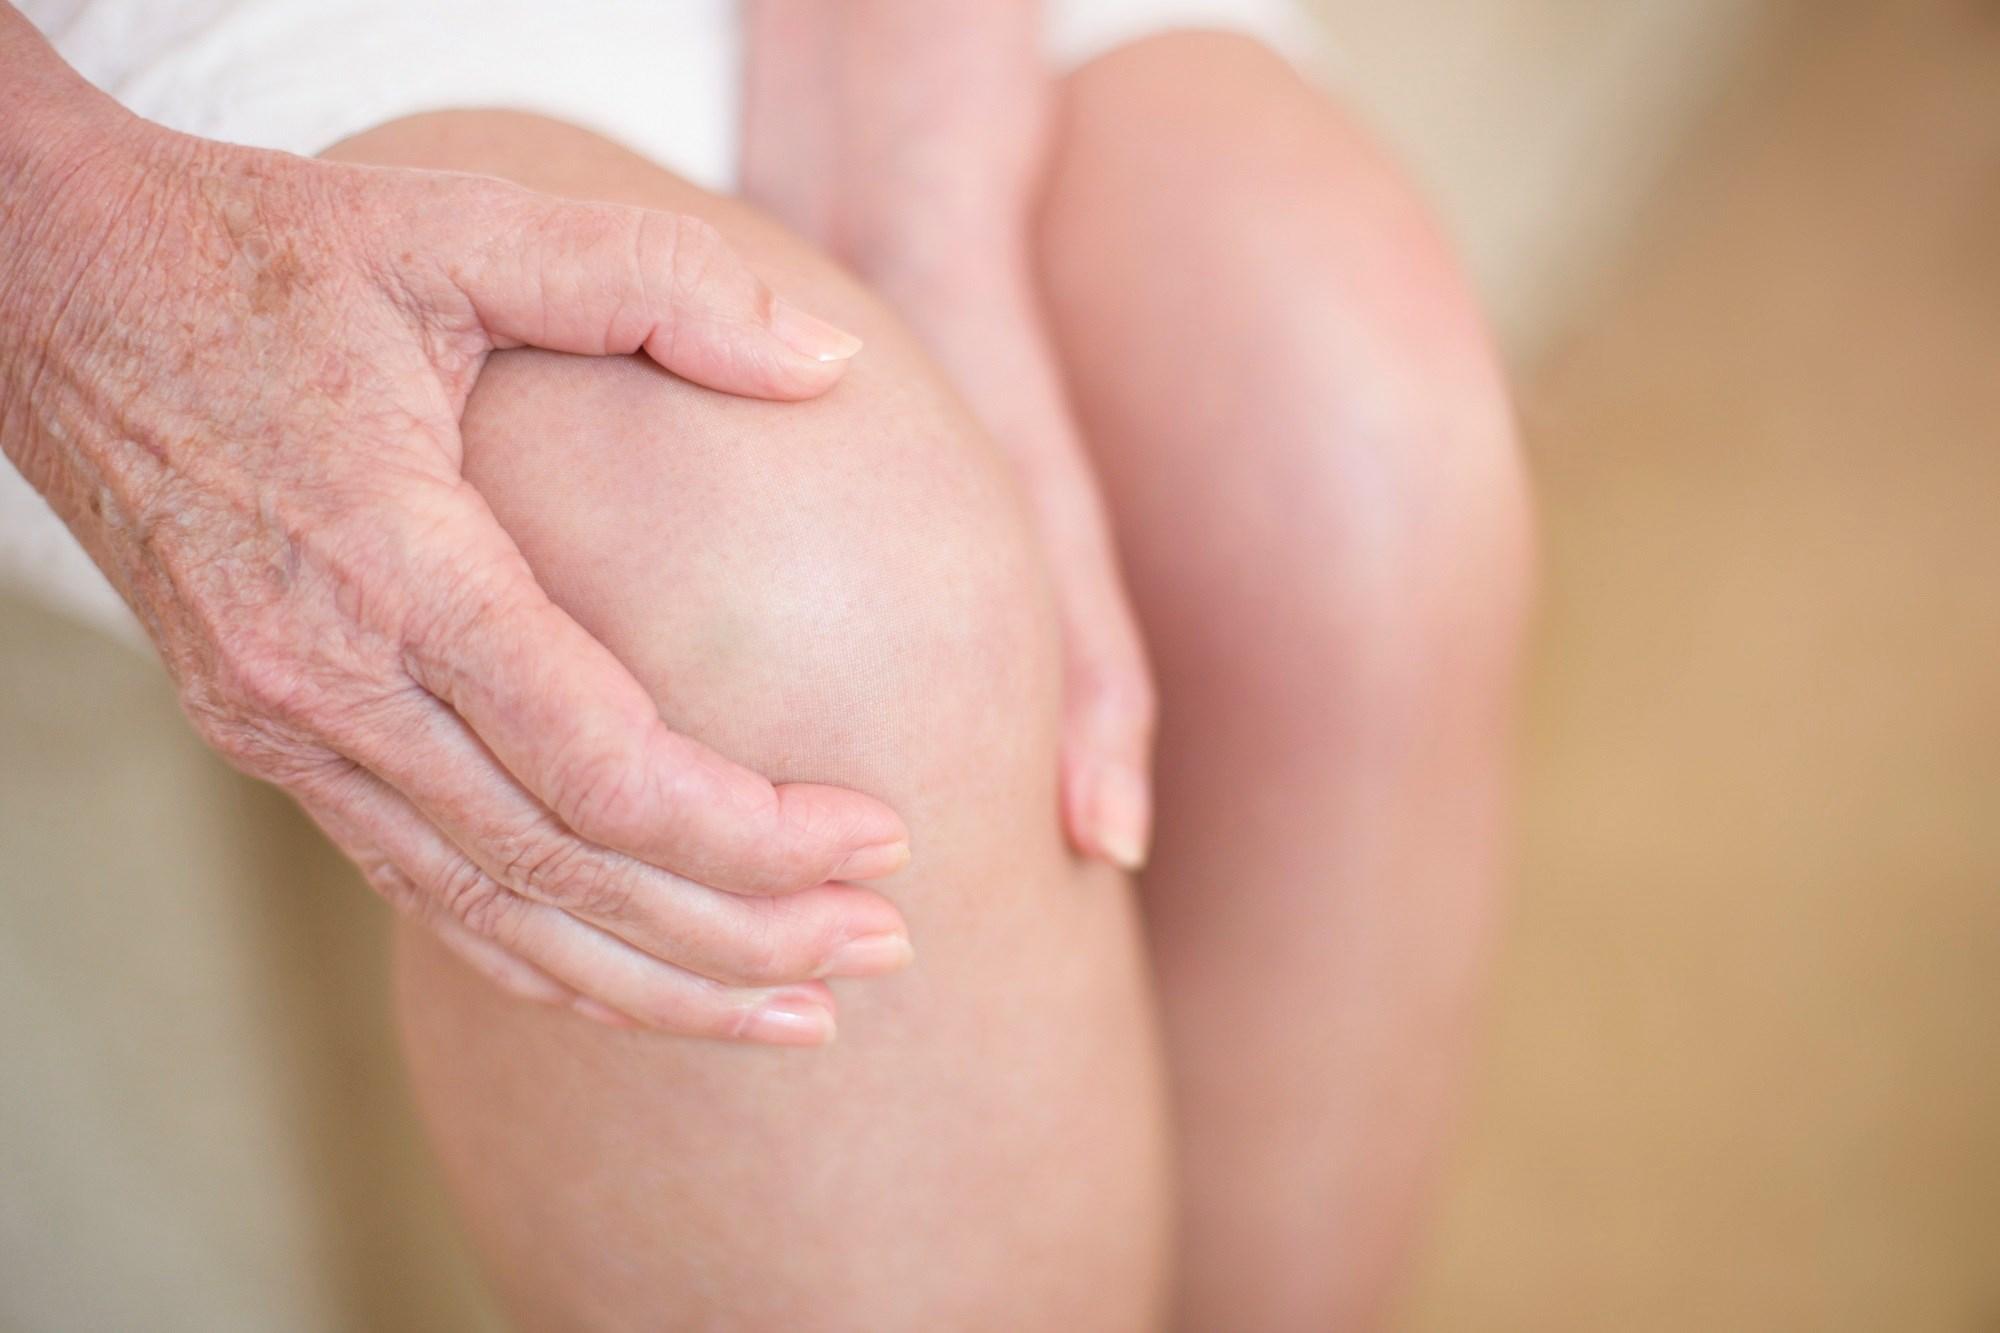 Lutikizumab May Not Improve Pain, Inflammation in Knee Osteoarthritis